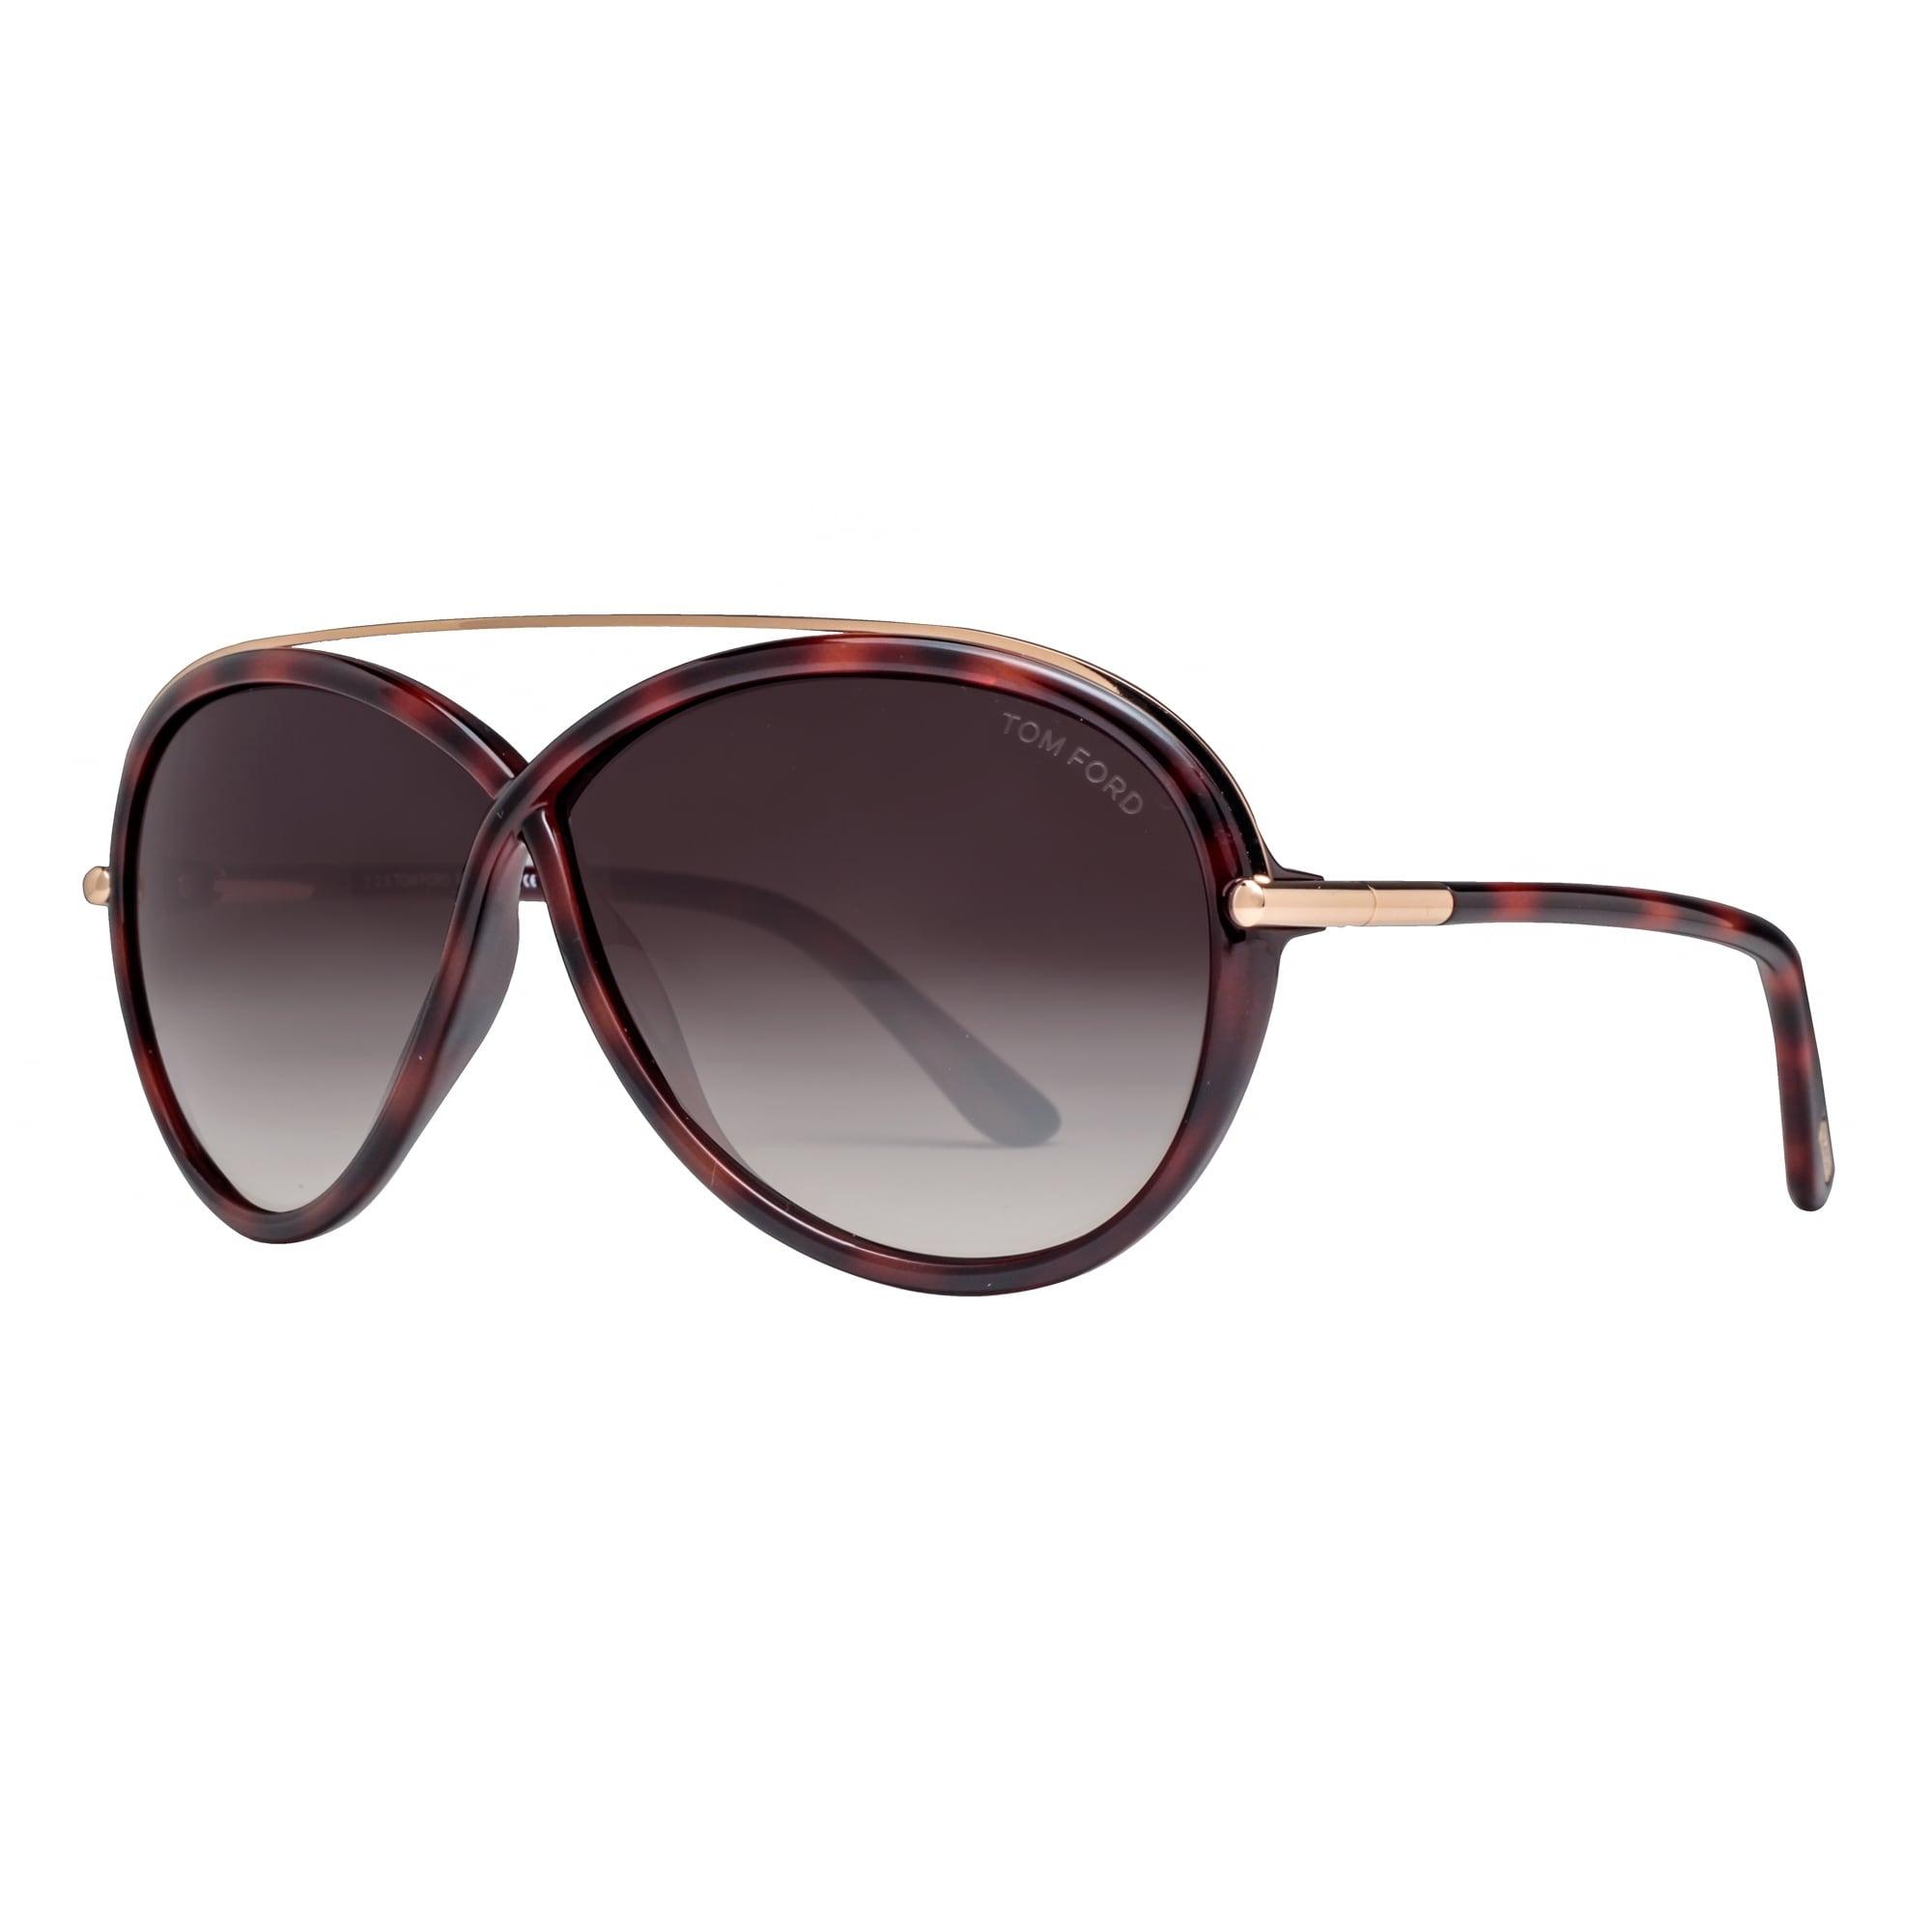 9c72970206f2 Shop Tom Ford Tamara TF 454 52K Dark Havana Brown Gradient Women s Oval  Sunglasses - dark havana brown gold - 64mm-5mm-130mm - Free Shipping Today  ...